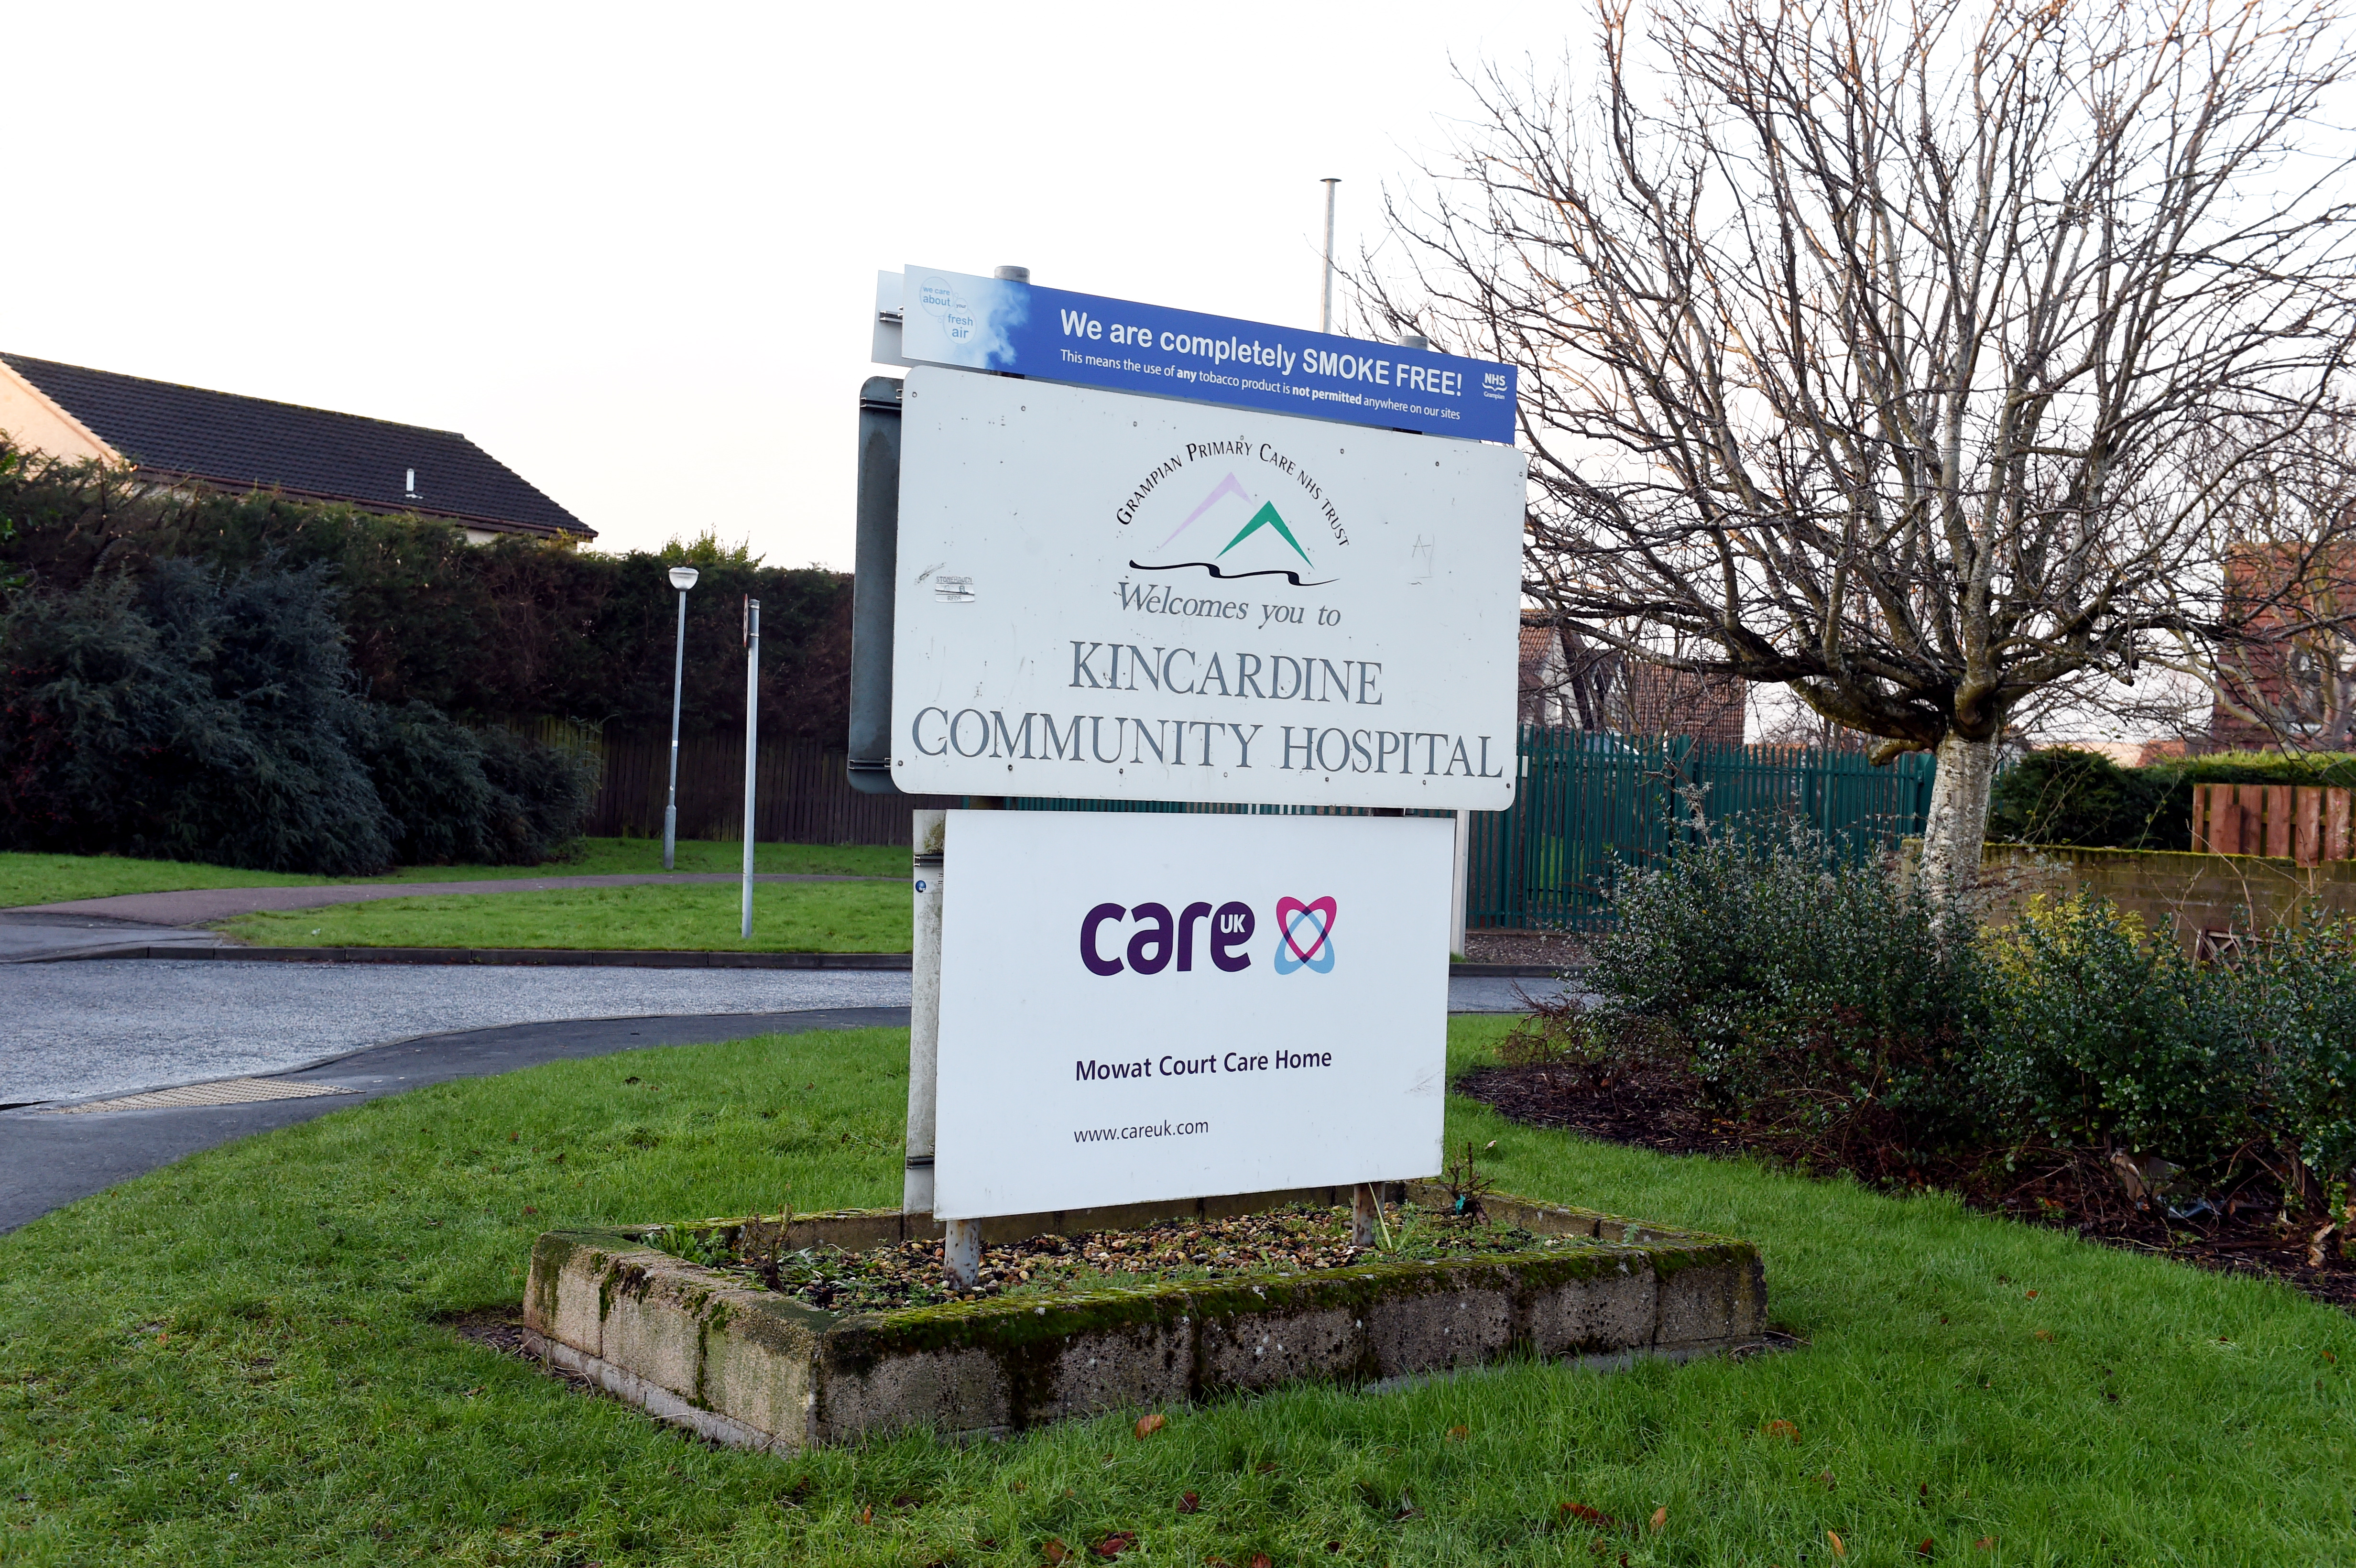 Kincardine Community Hospital.